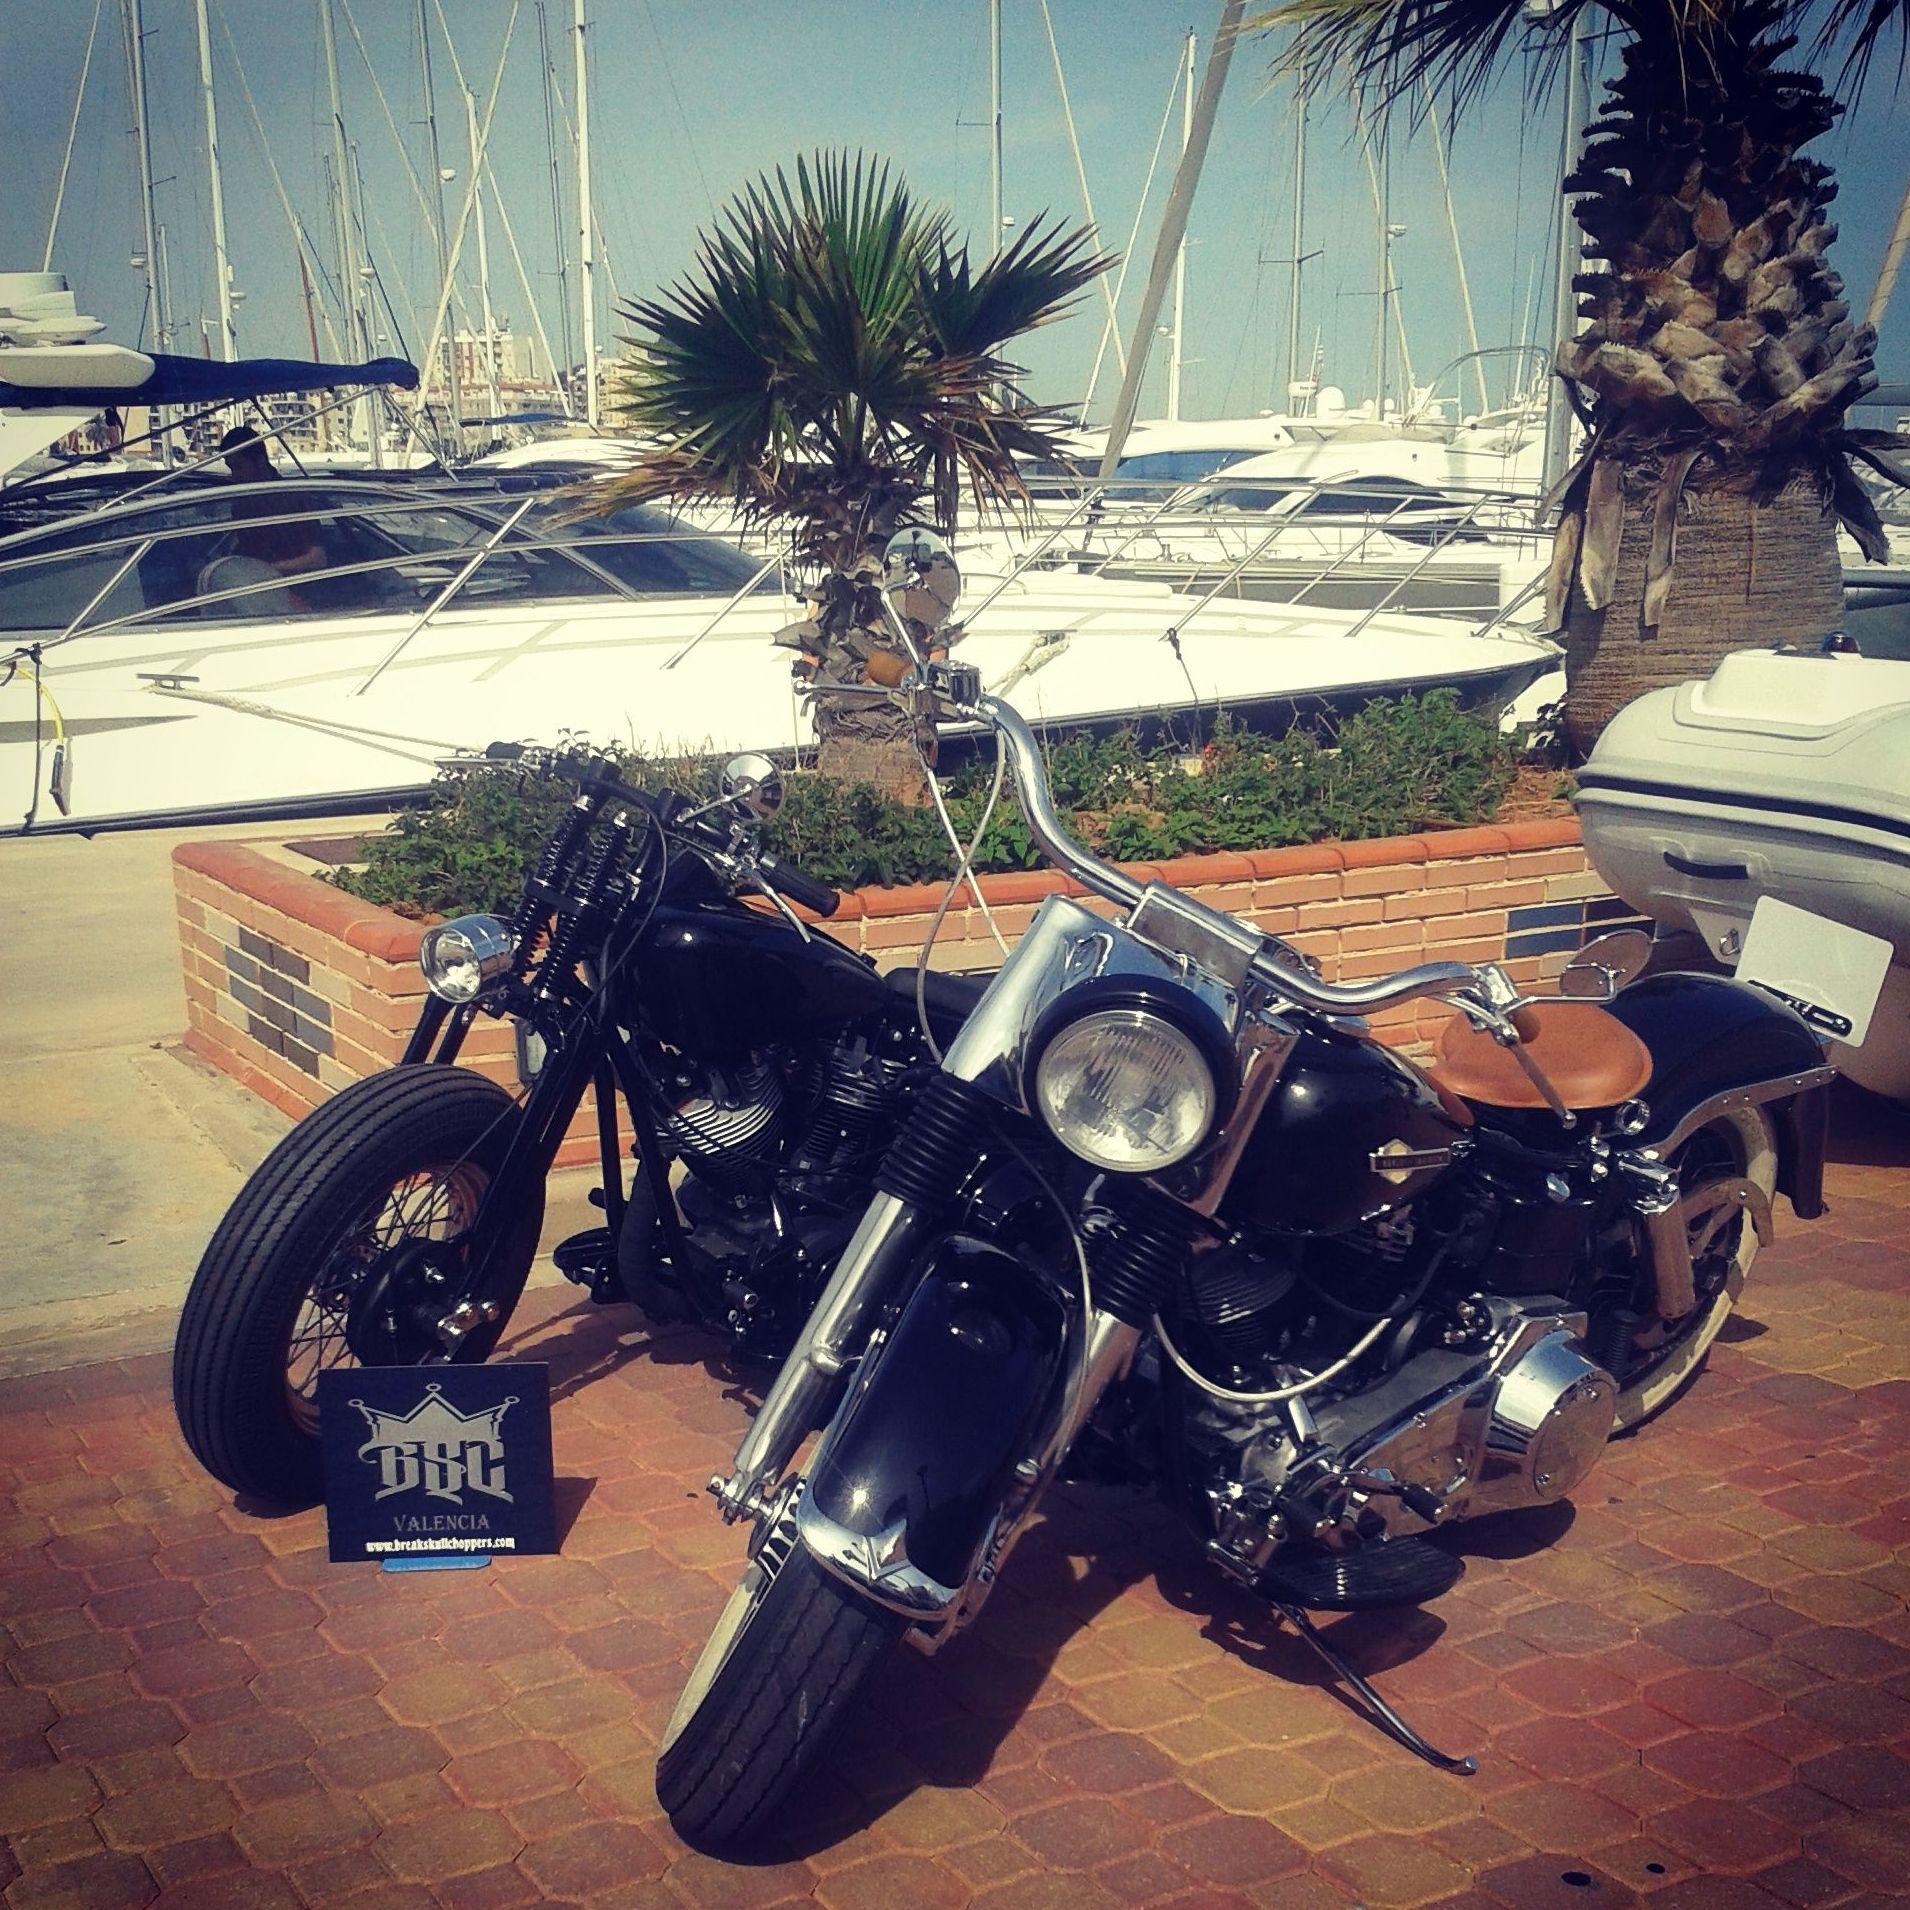 venta shovel, venta harley davidson, transformación motos, , transformación harley davidson, customizar motos